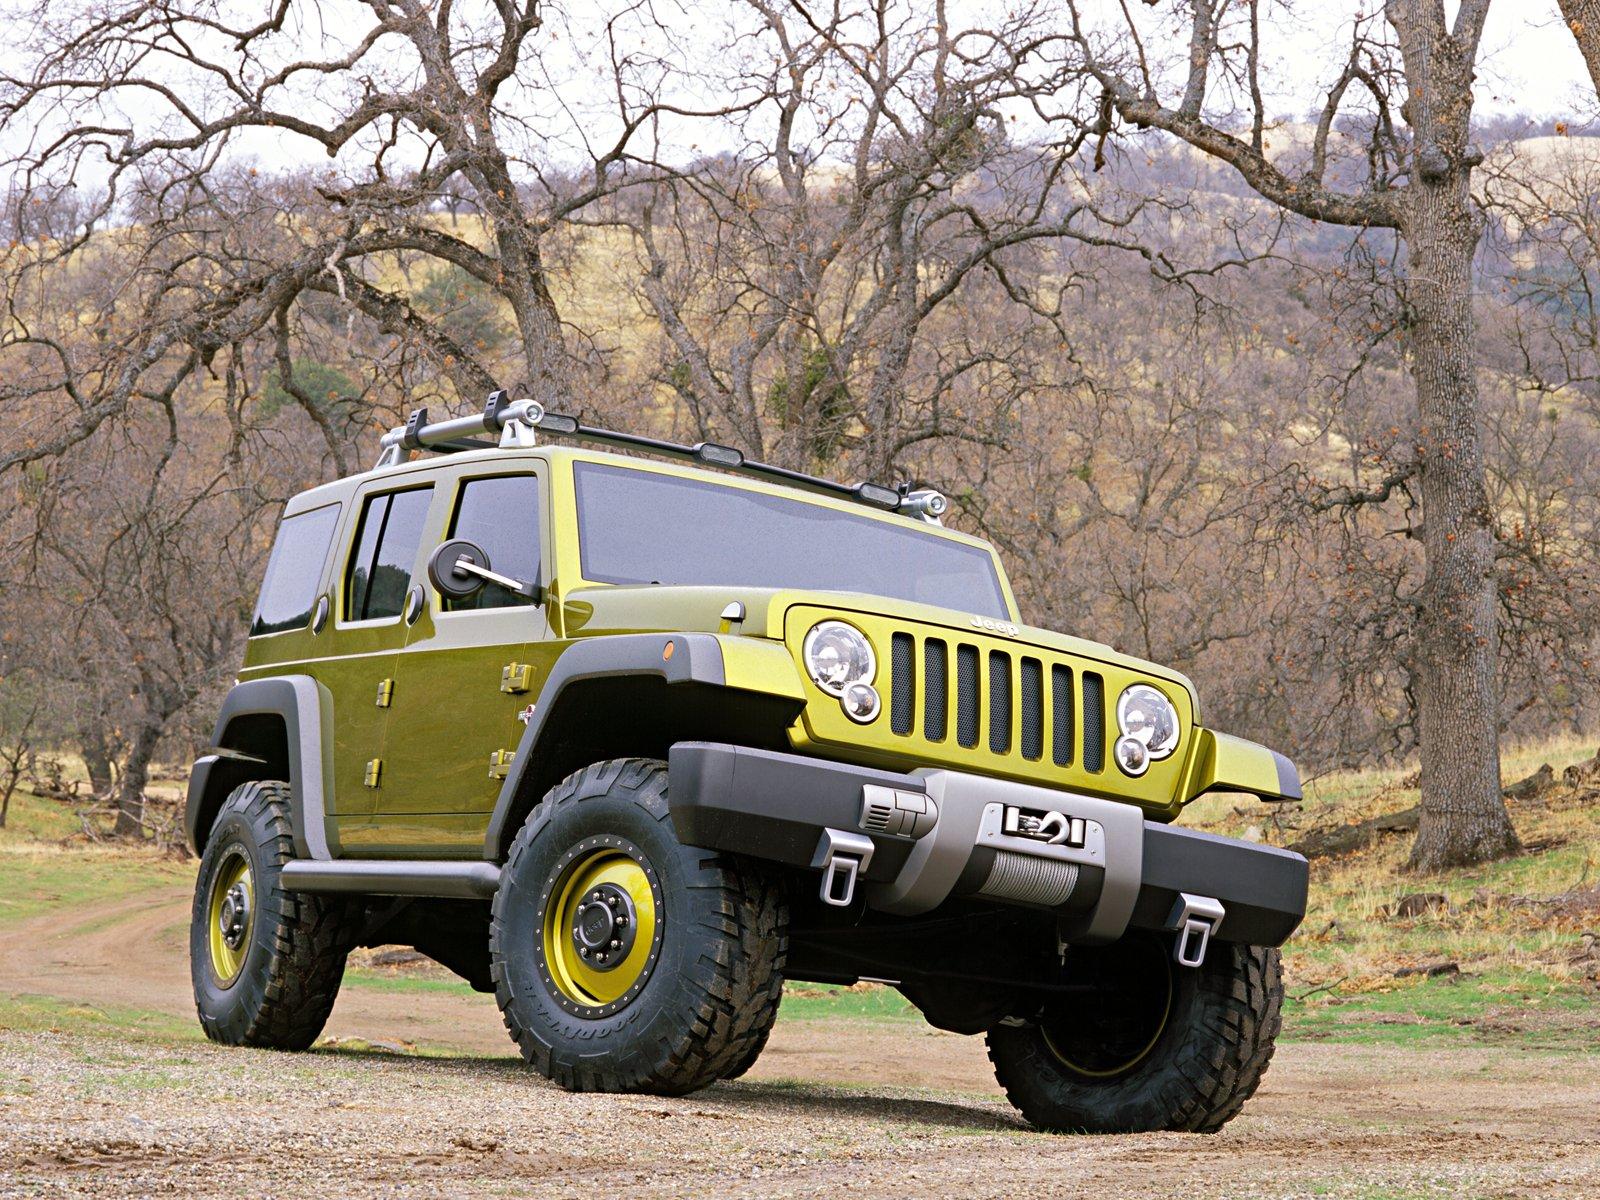 jeep越野车 分辨率1600x1200壁纸 电脑桌面图片精美墙纸 高清图片